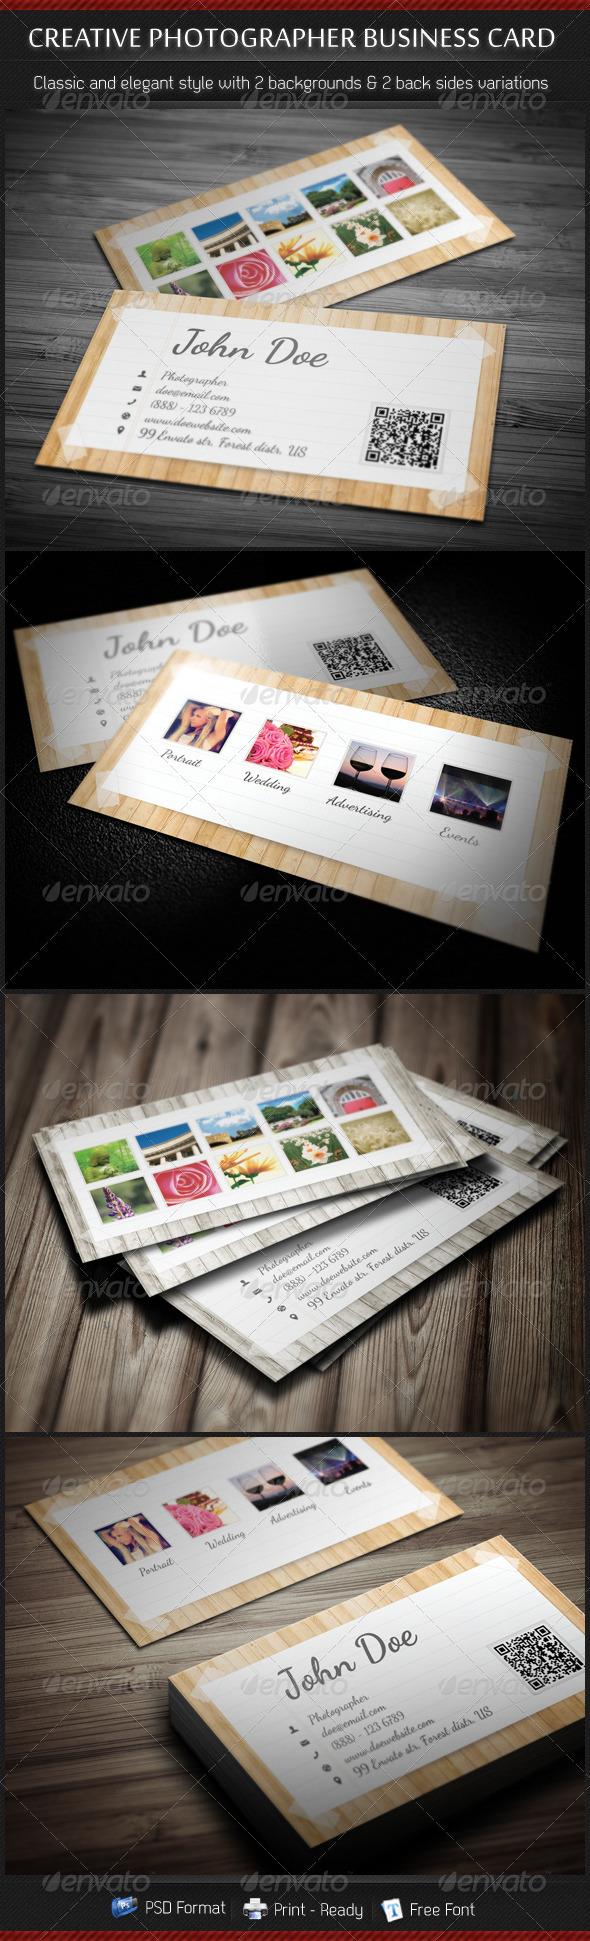 Creative Photographer Business Card - Creative Business Cards